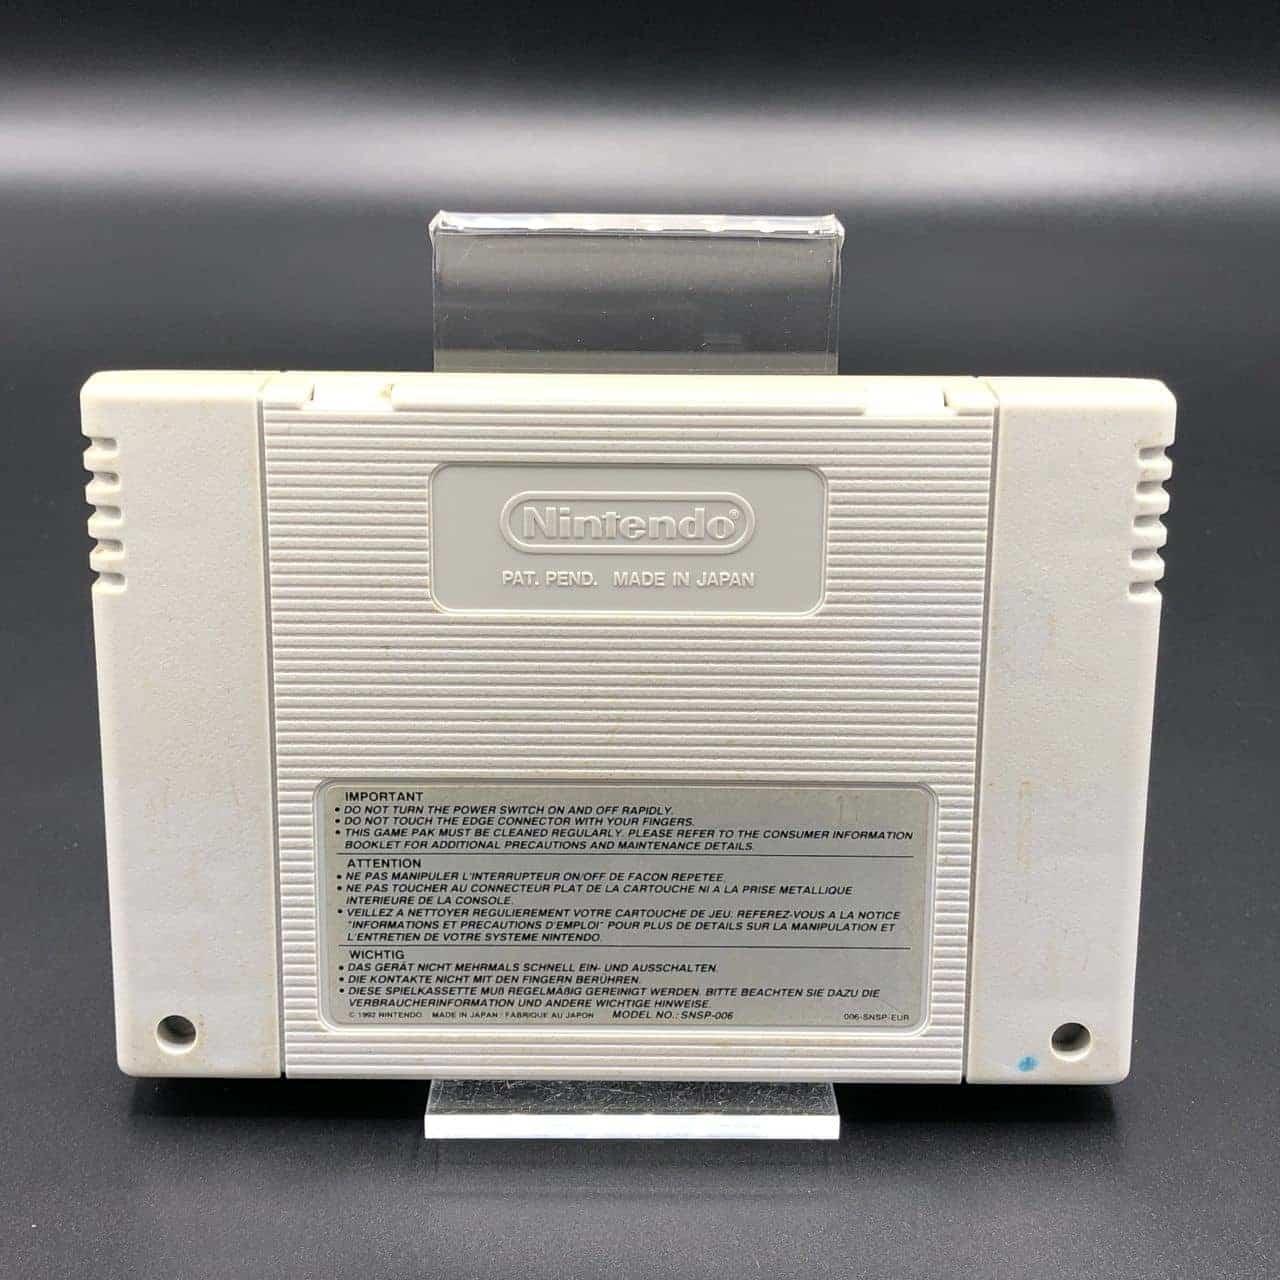 SNES The Legend of Zelda: A Link to the Past (Modul) (Gebrauchsspuren) Super Nintendo